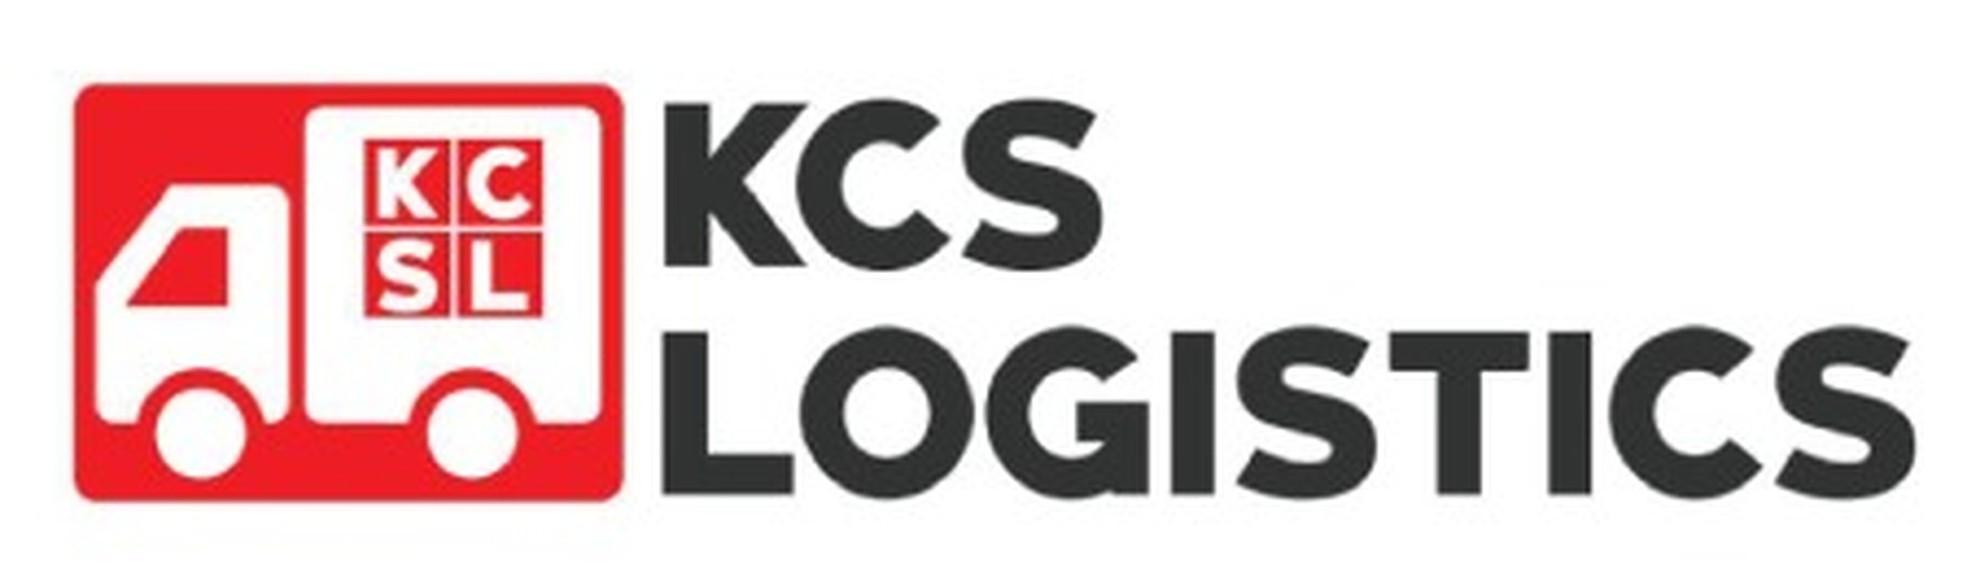 KCS LOGISTICS, COURIER SERVICE,  service in Palayam, Kozhikode